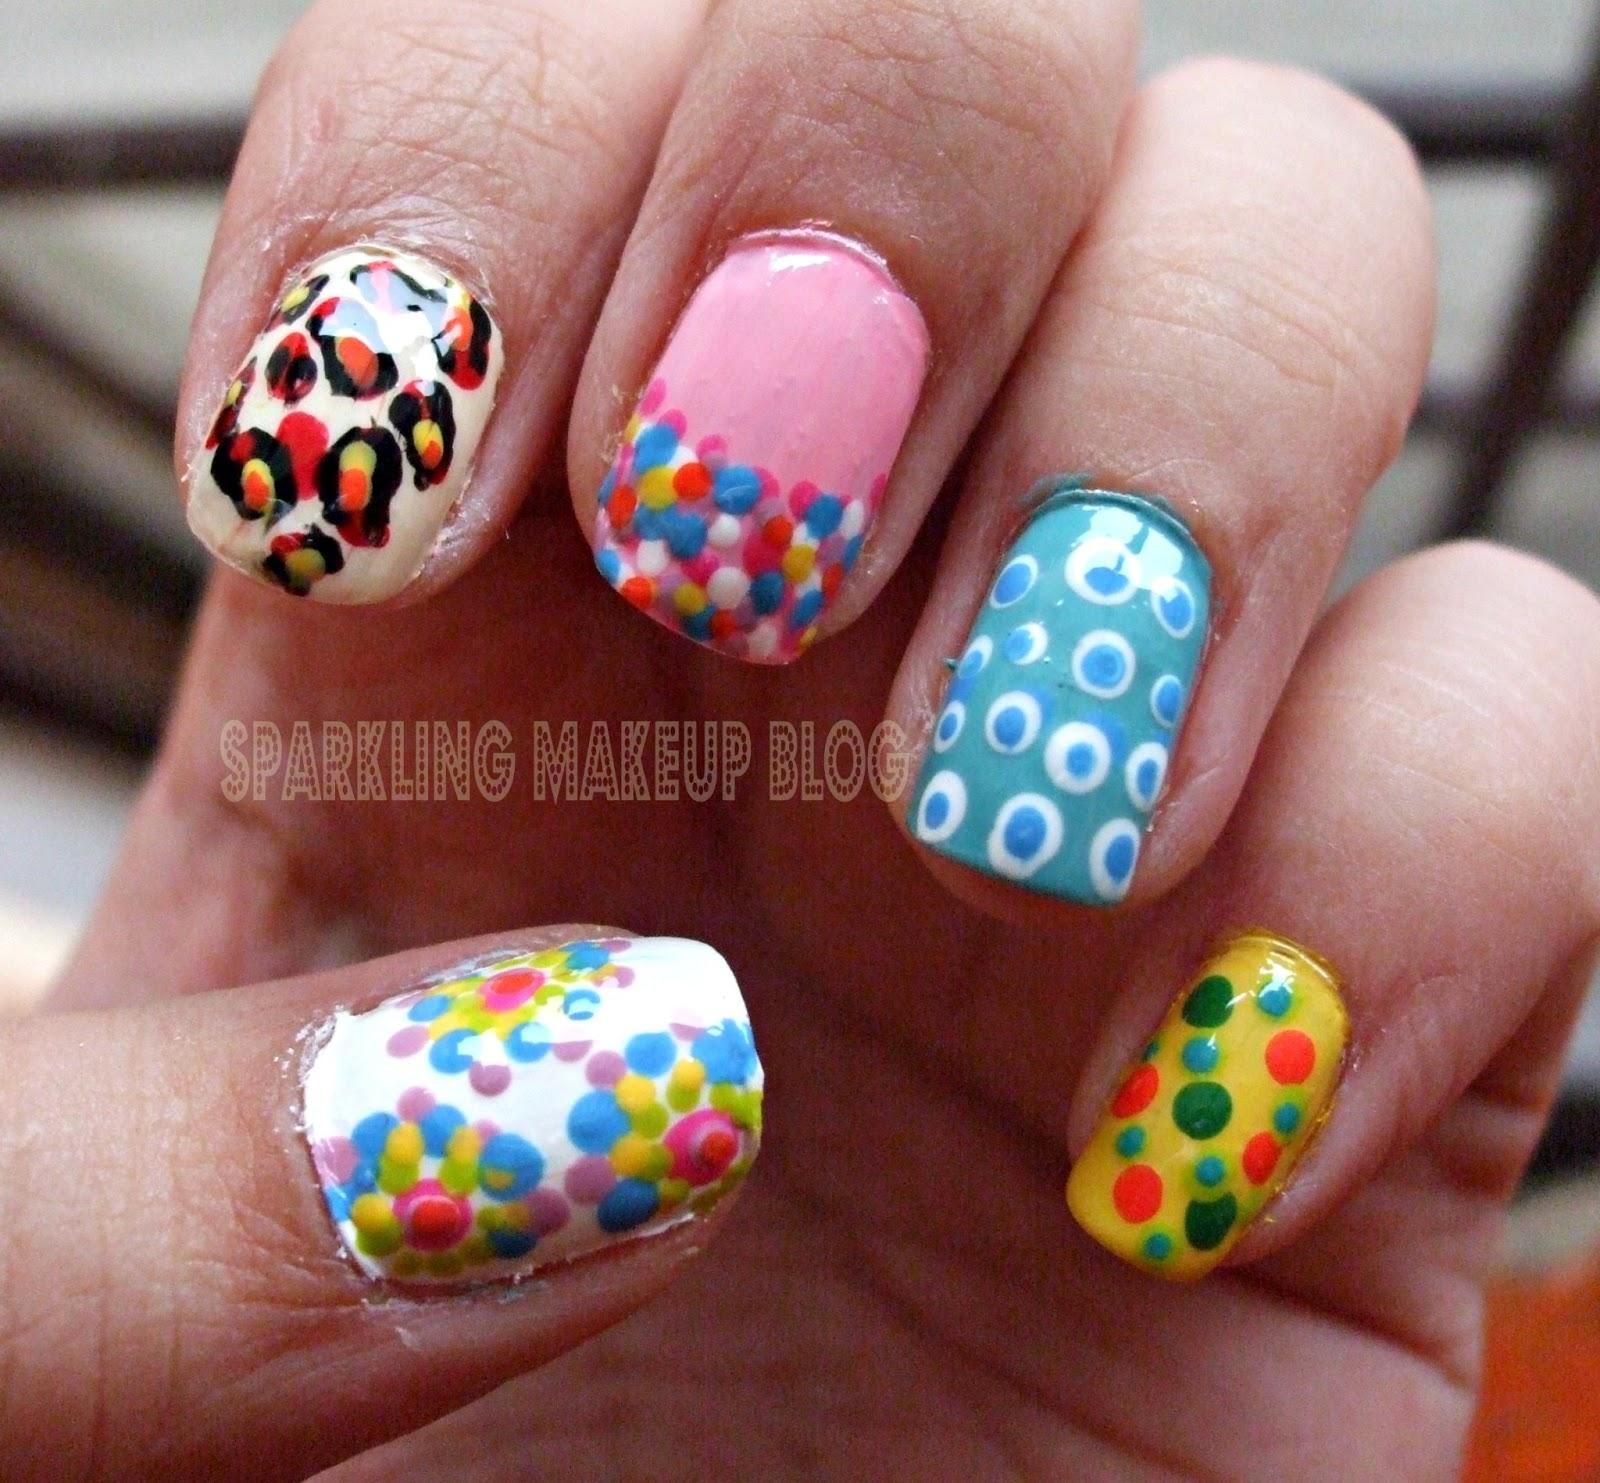 2 way wooden dotting pen tool from born pretty store nail art dot dot dot nail art prinsesfo Gallery